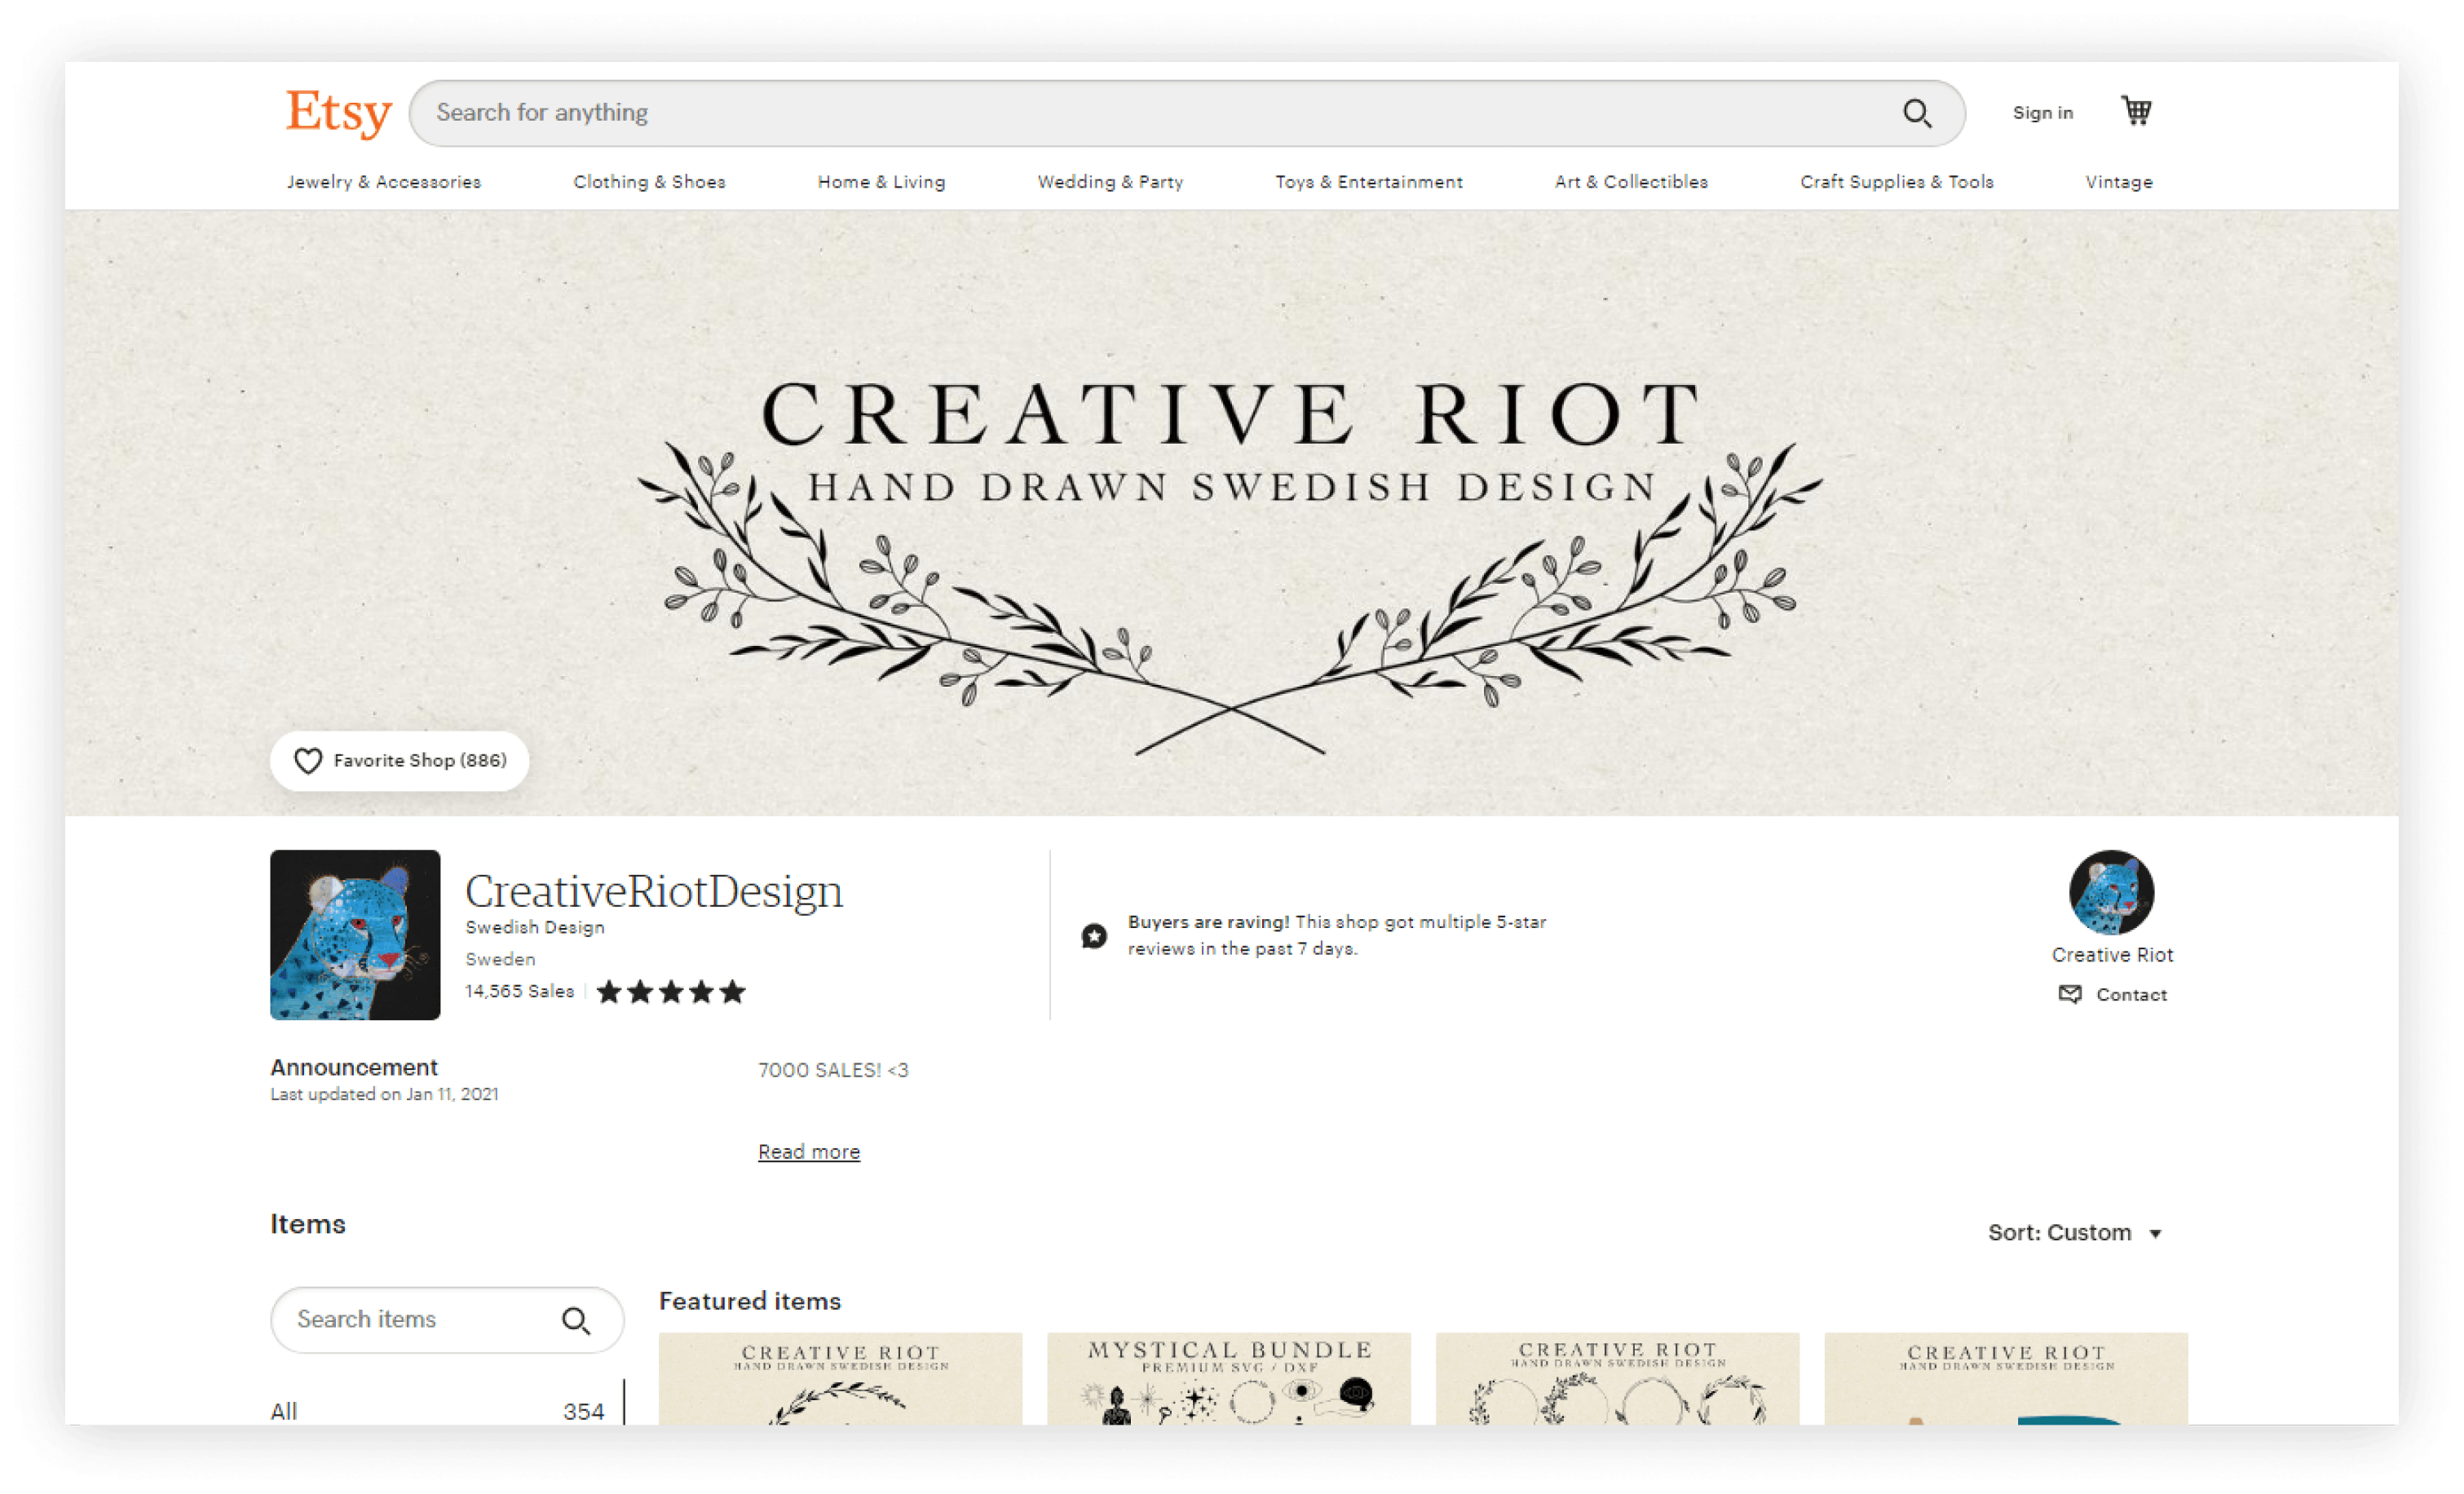 CreativeRiotDesign